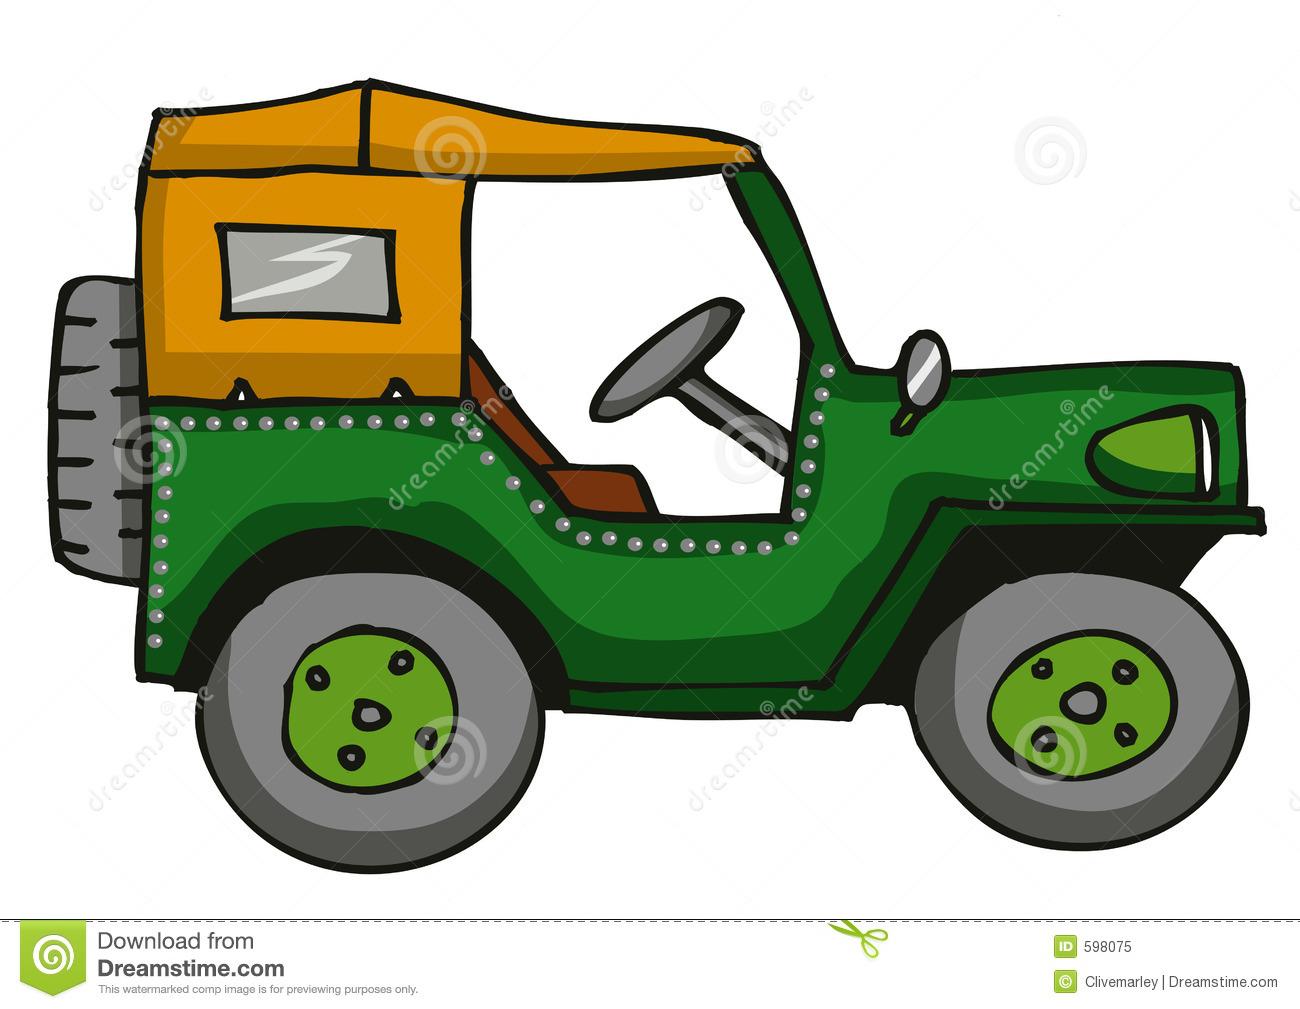 Jeep clipart. Cartoon